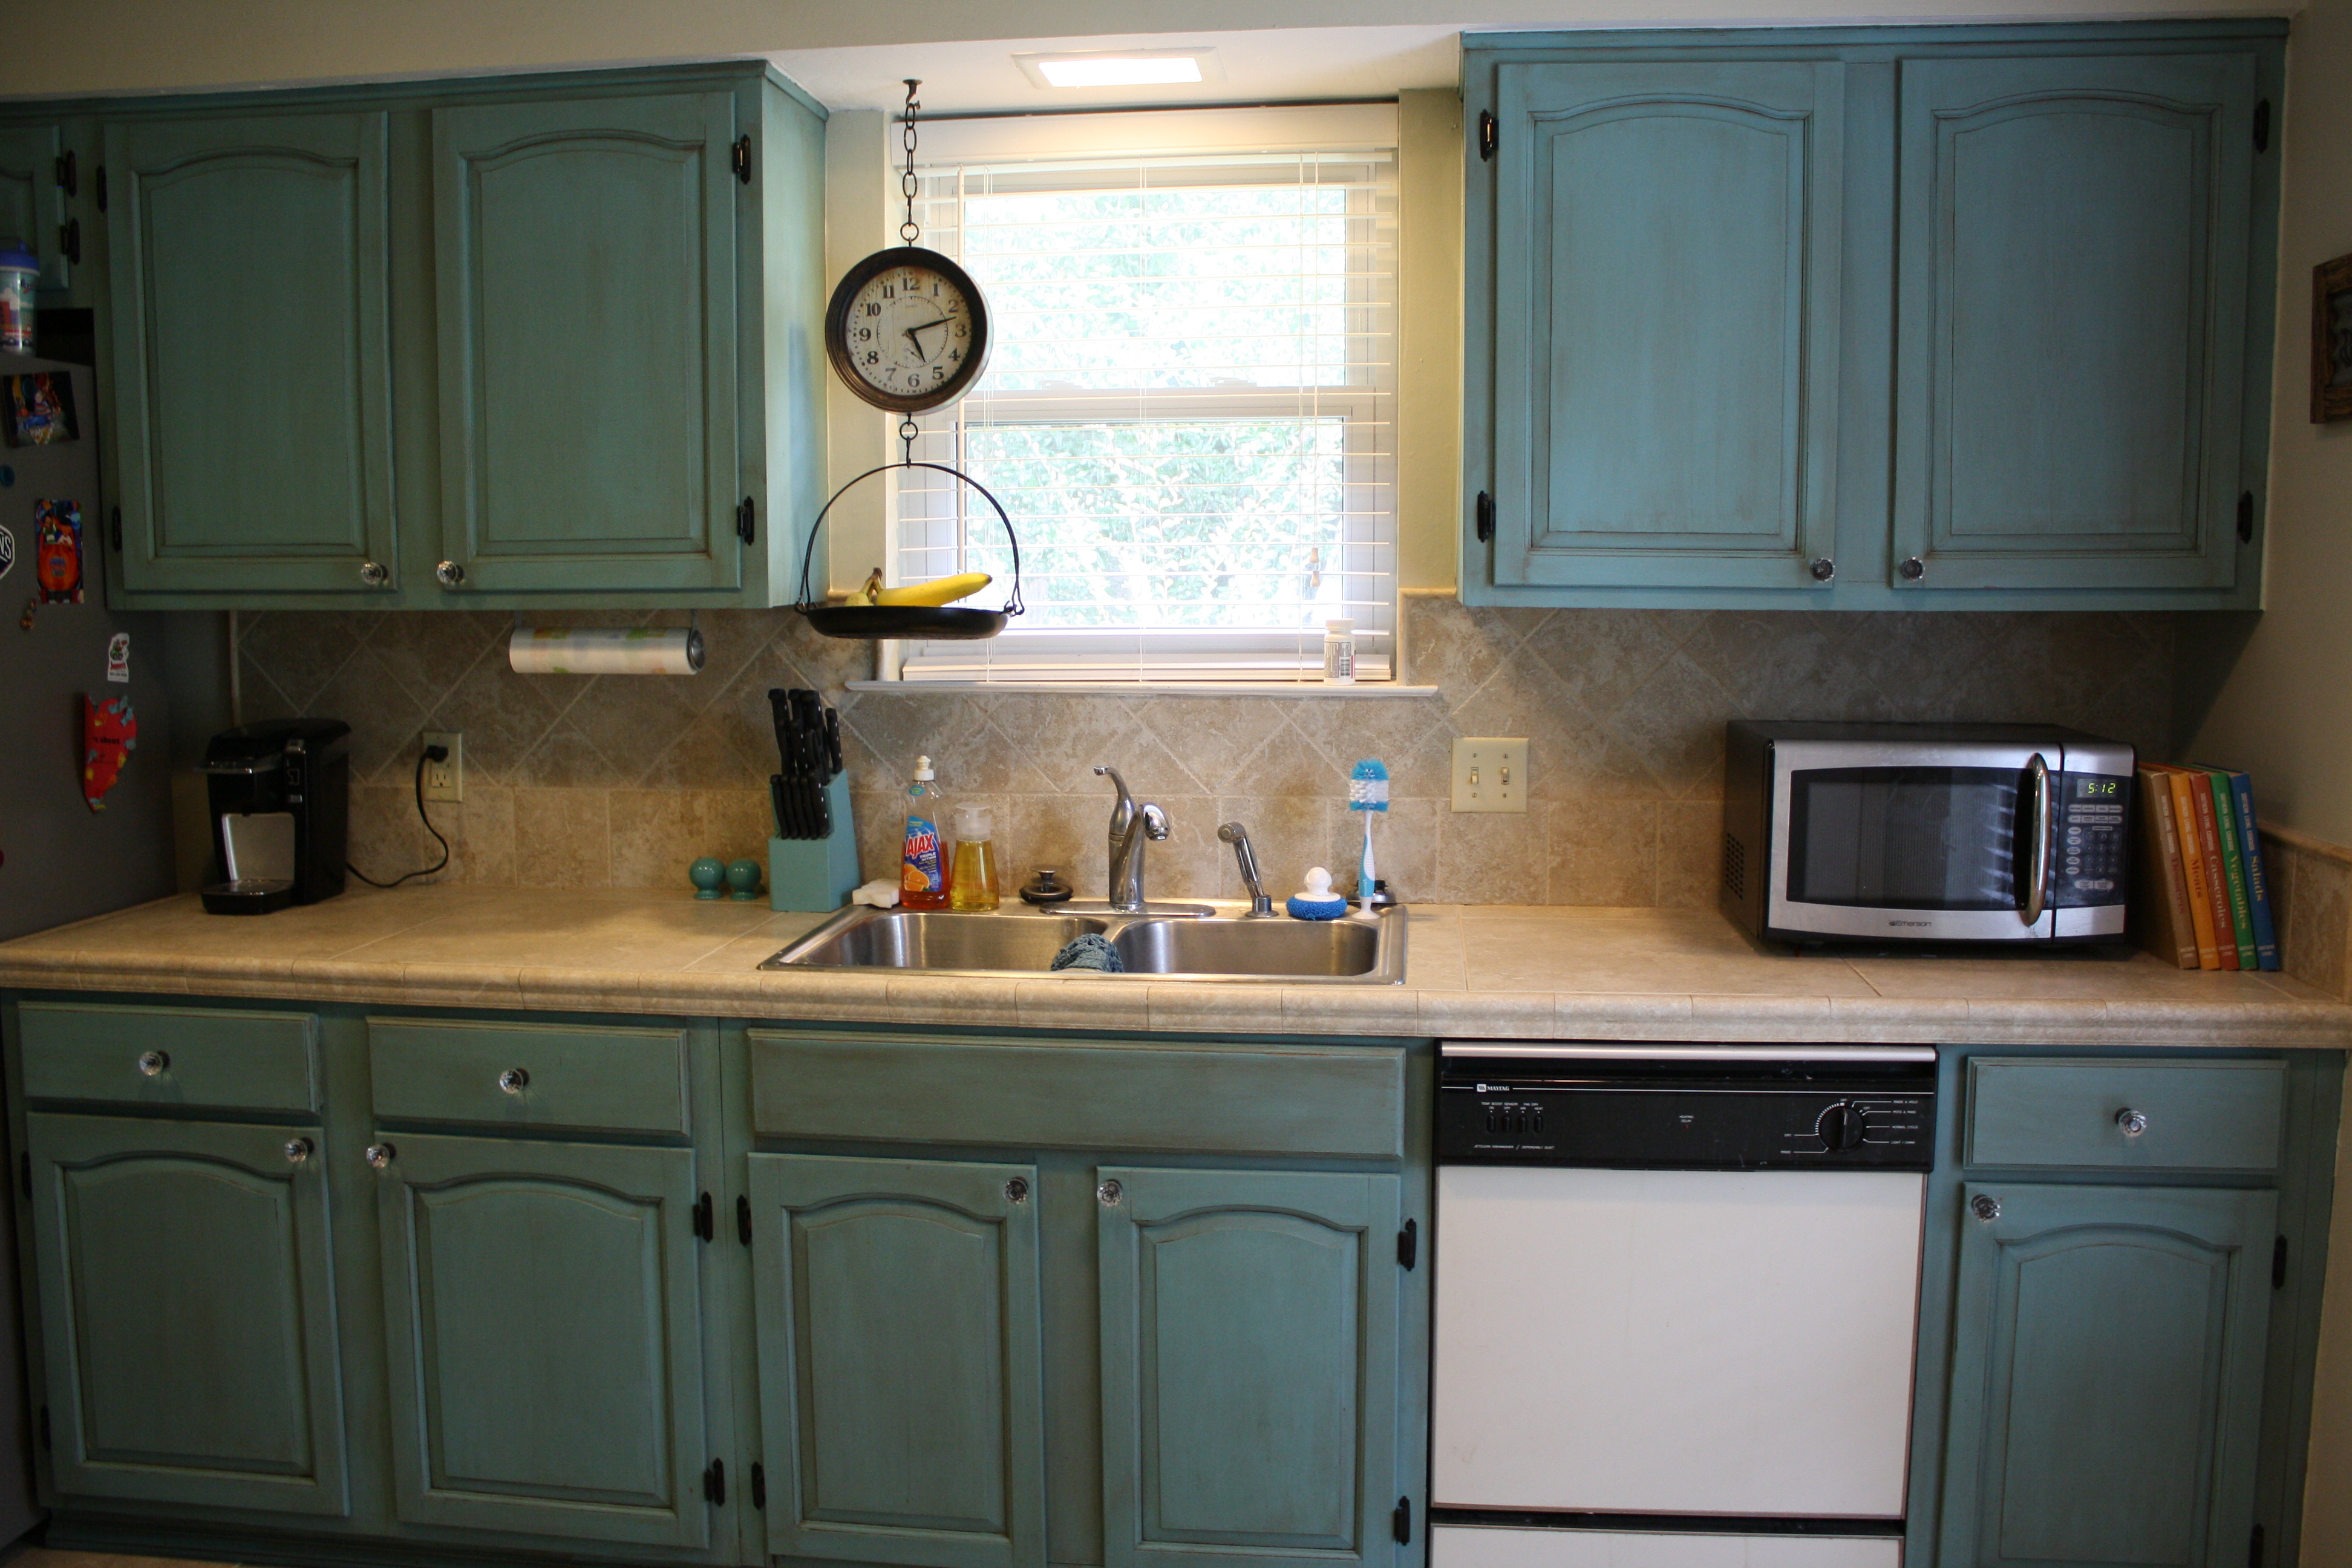 painting kitchen cabinets annie sloan chalk paint chalk paint kitchen cabinets IMG